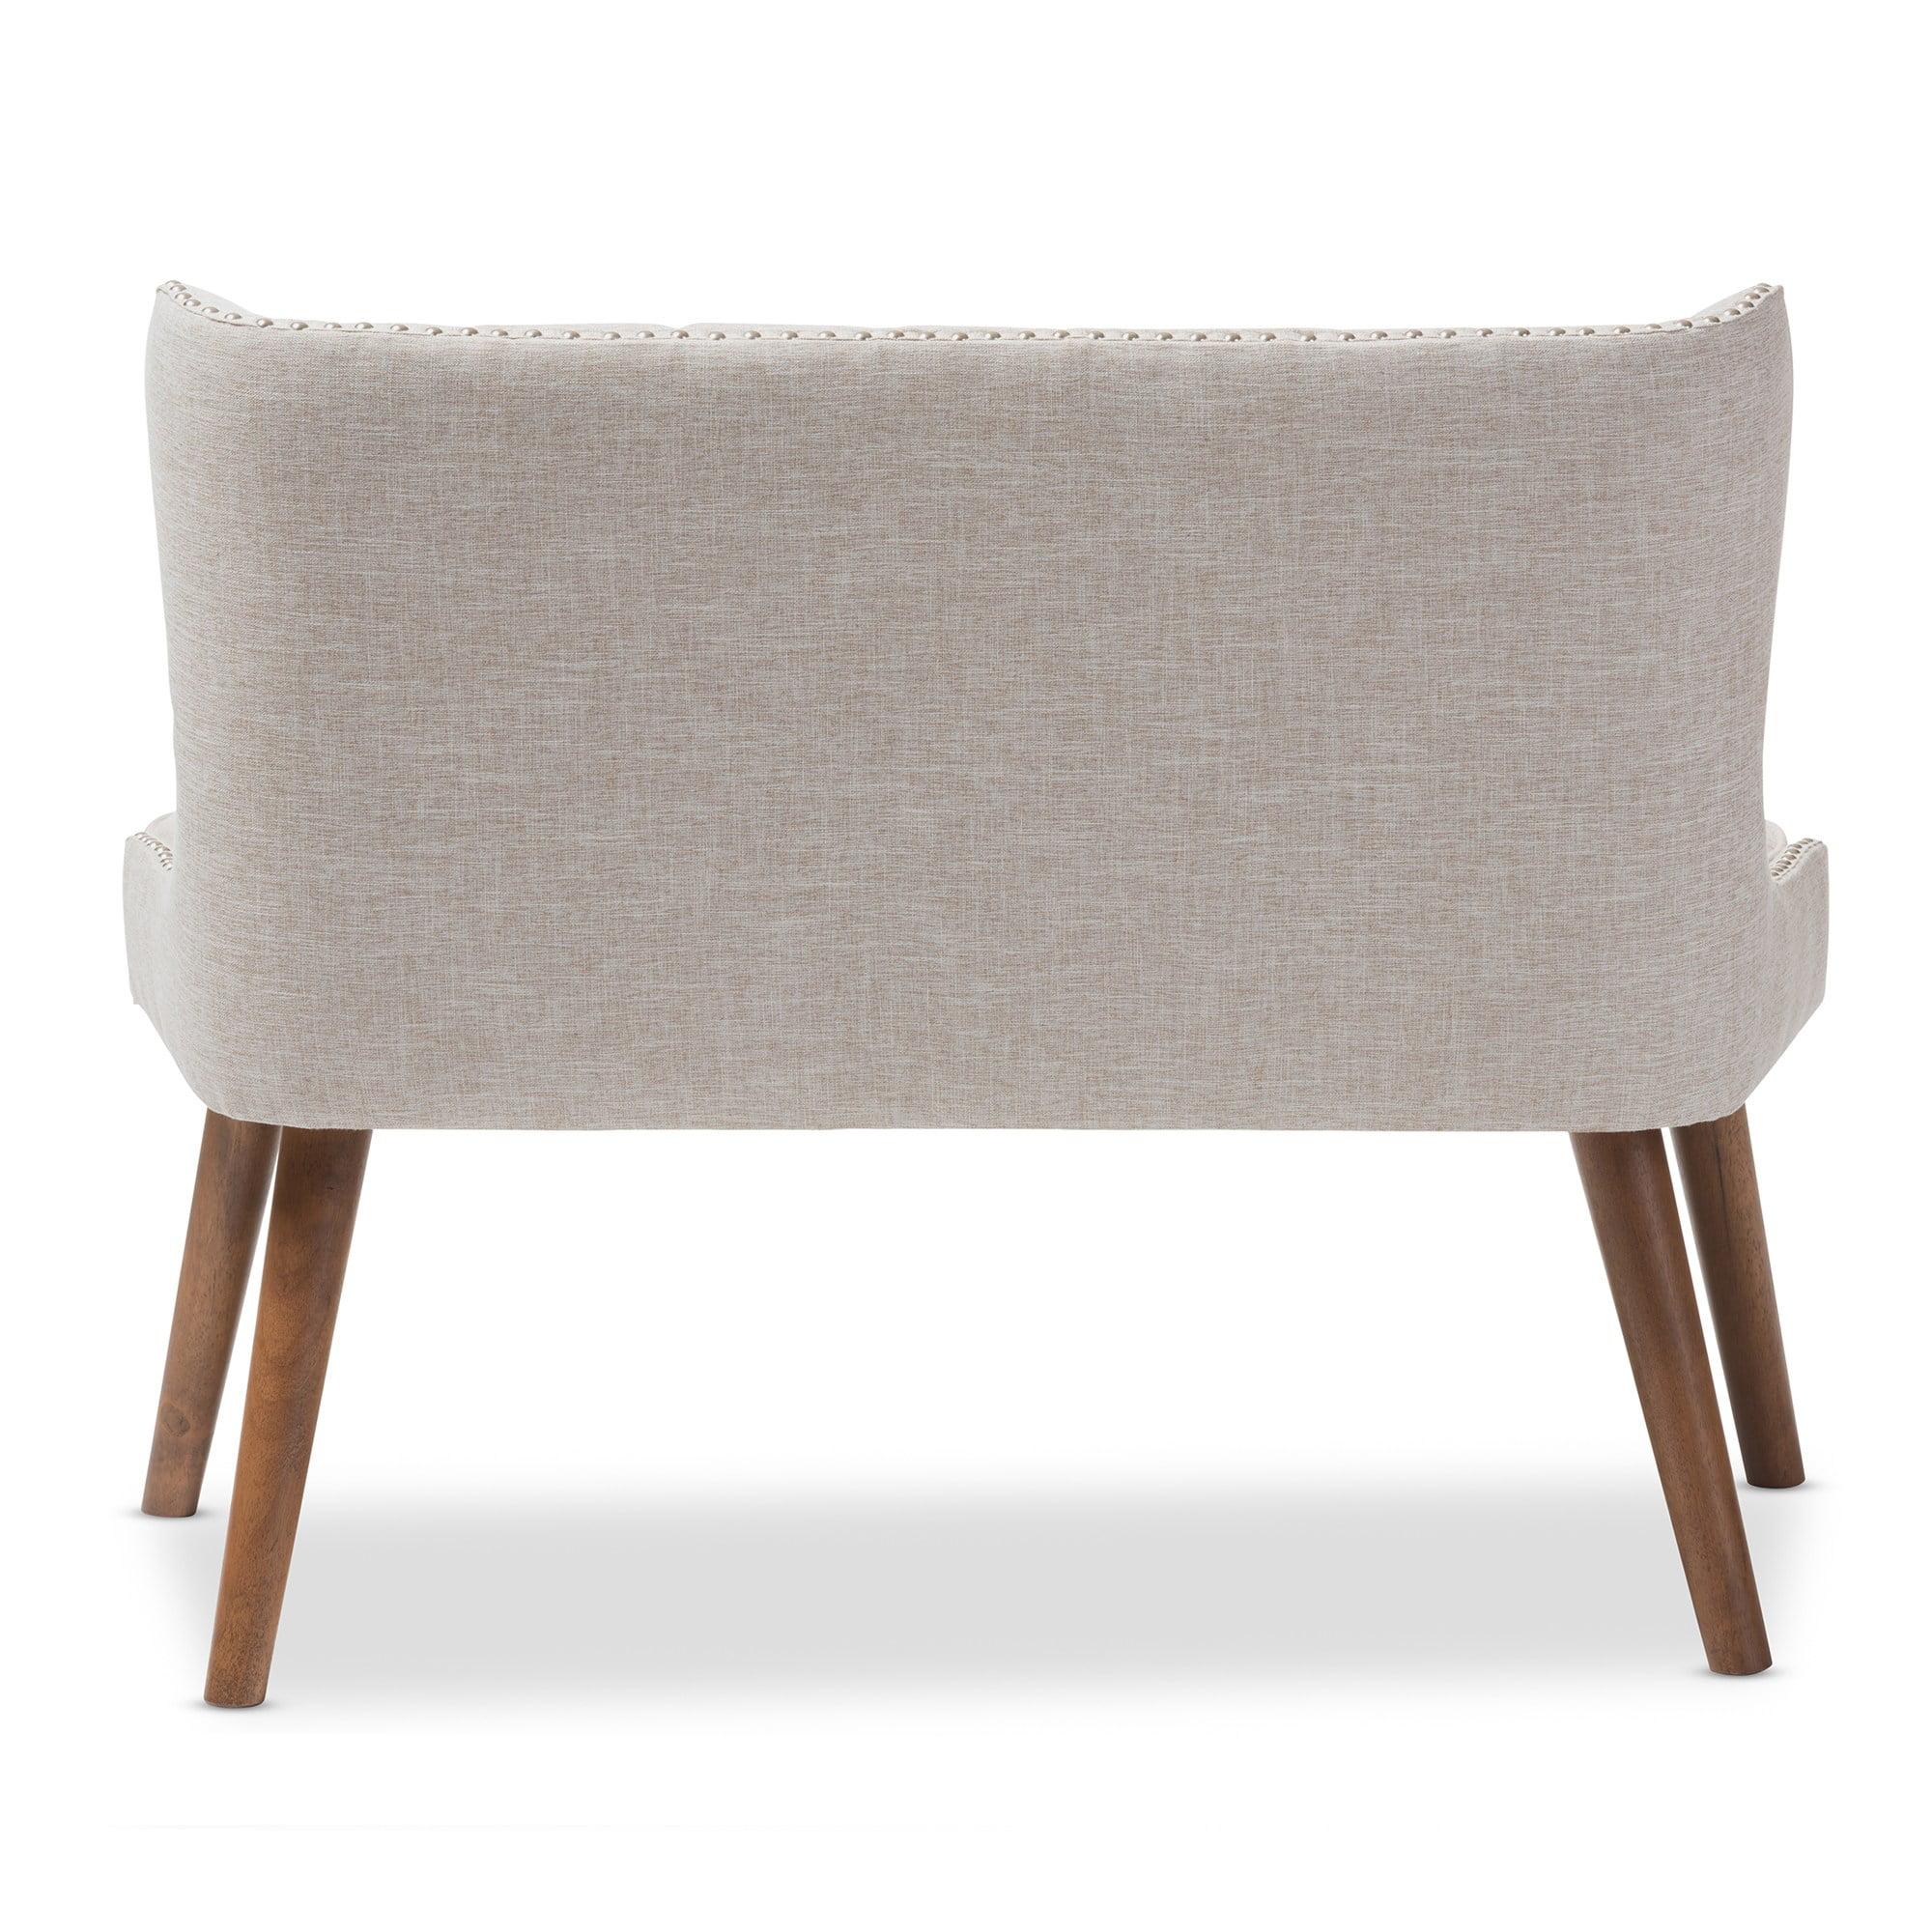 Carson Carrington Rudkobing Mid Century Modern Wood And Fabric Upholstered Button Tufting Loveseat Walmart Com Walmart Com